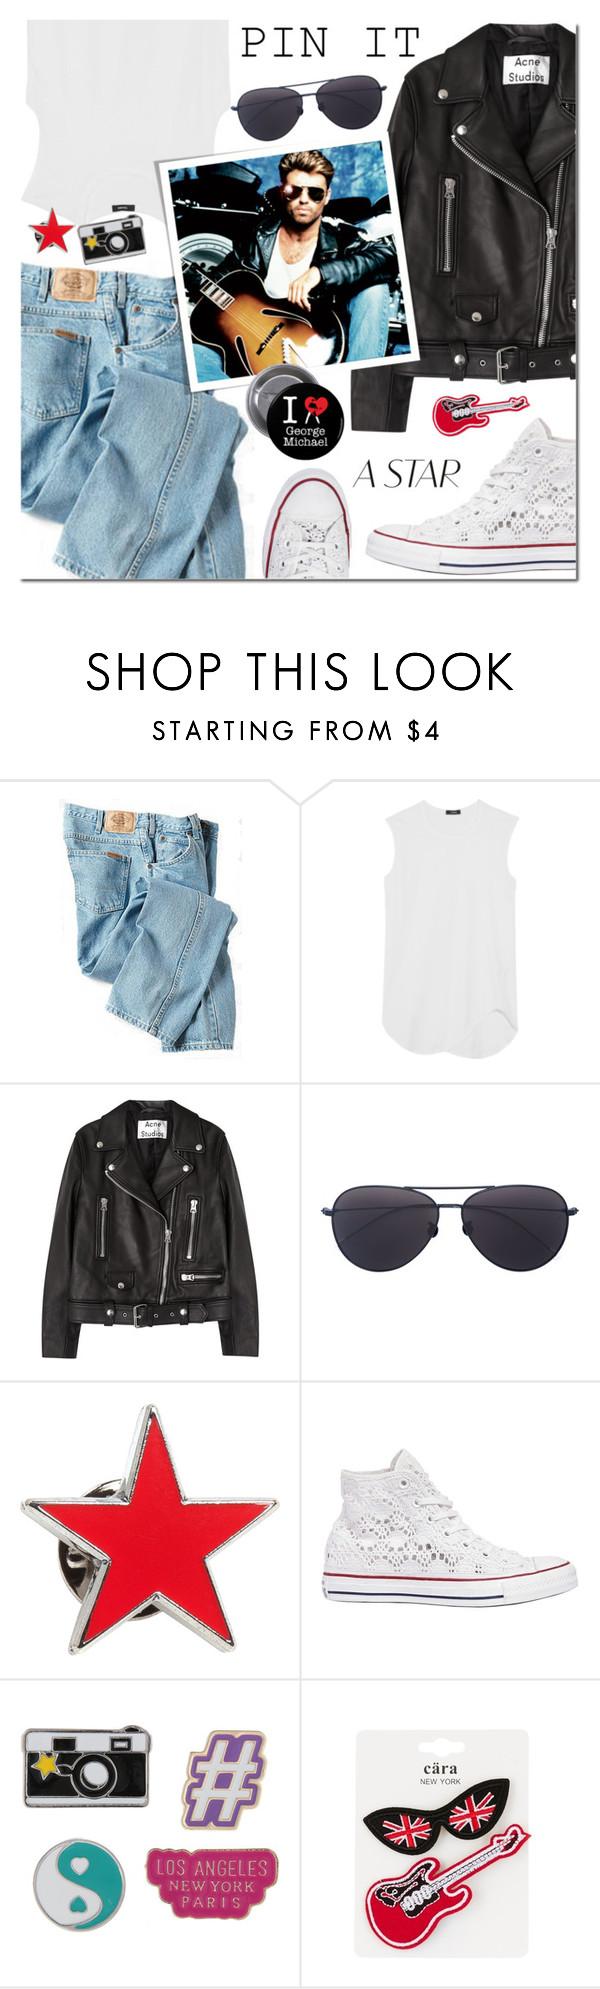 George Michael | Clothes design, Fashion, Boho fashion